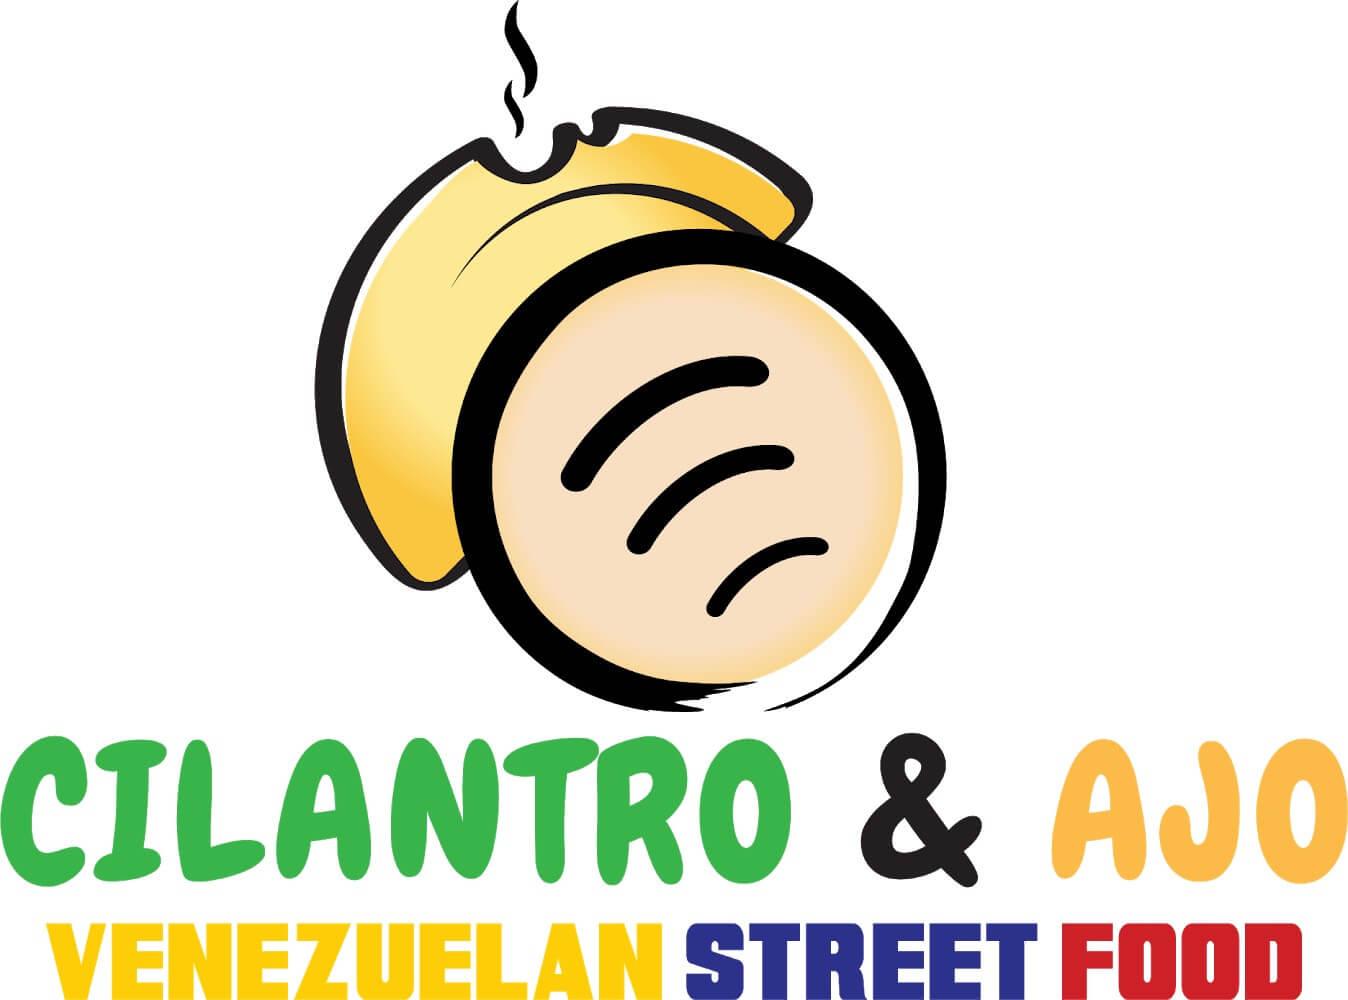 Venezuelan Street Food